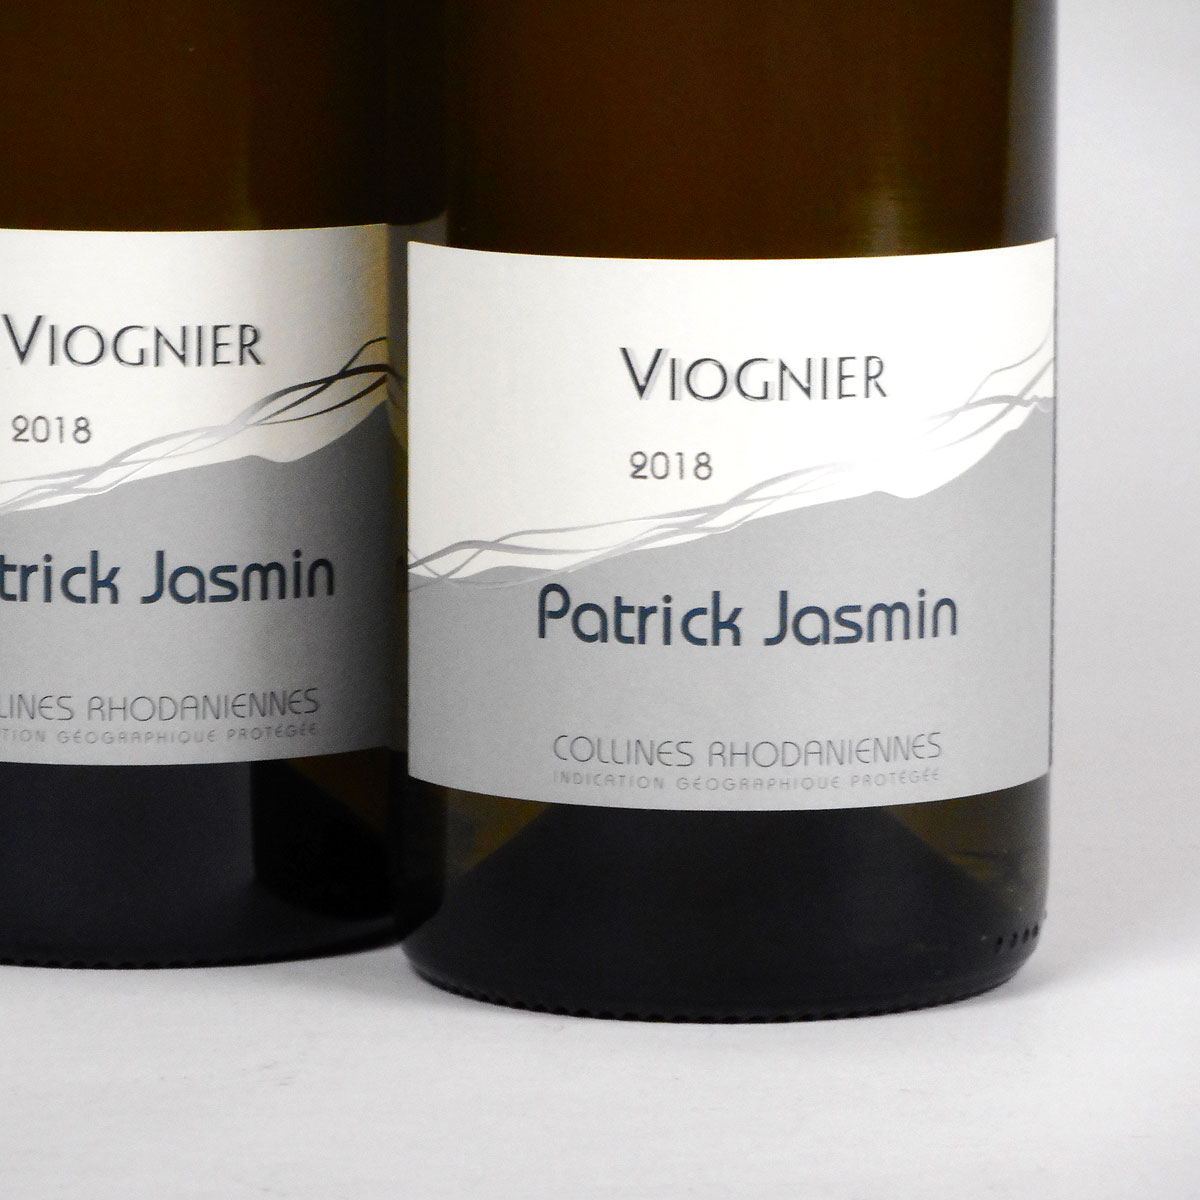 IGP Collines Rhodaniennes: Patrick Jasmin Viognier 2018